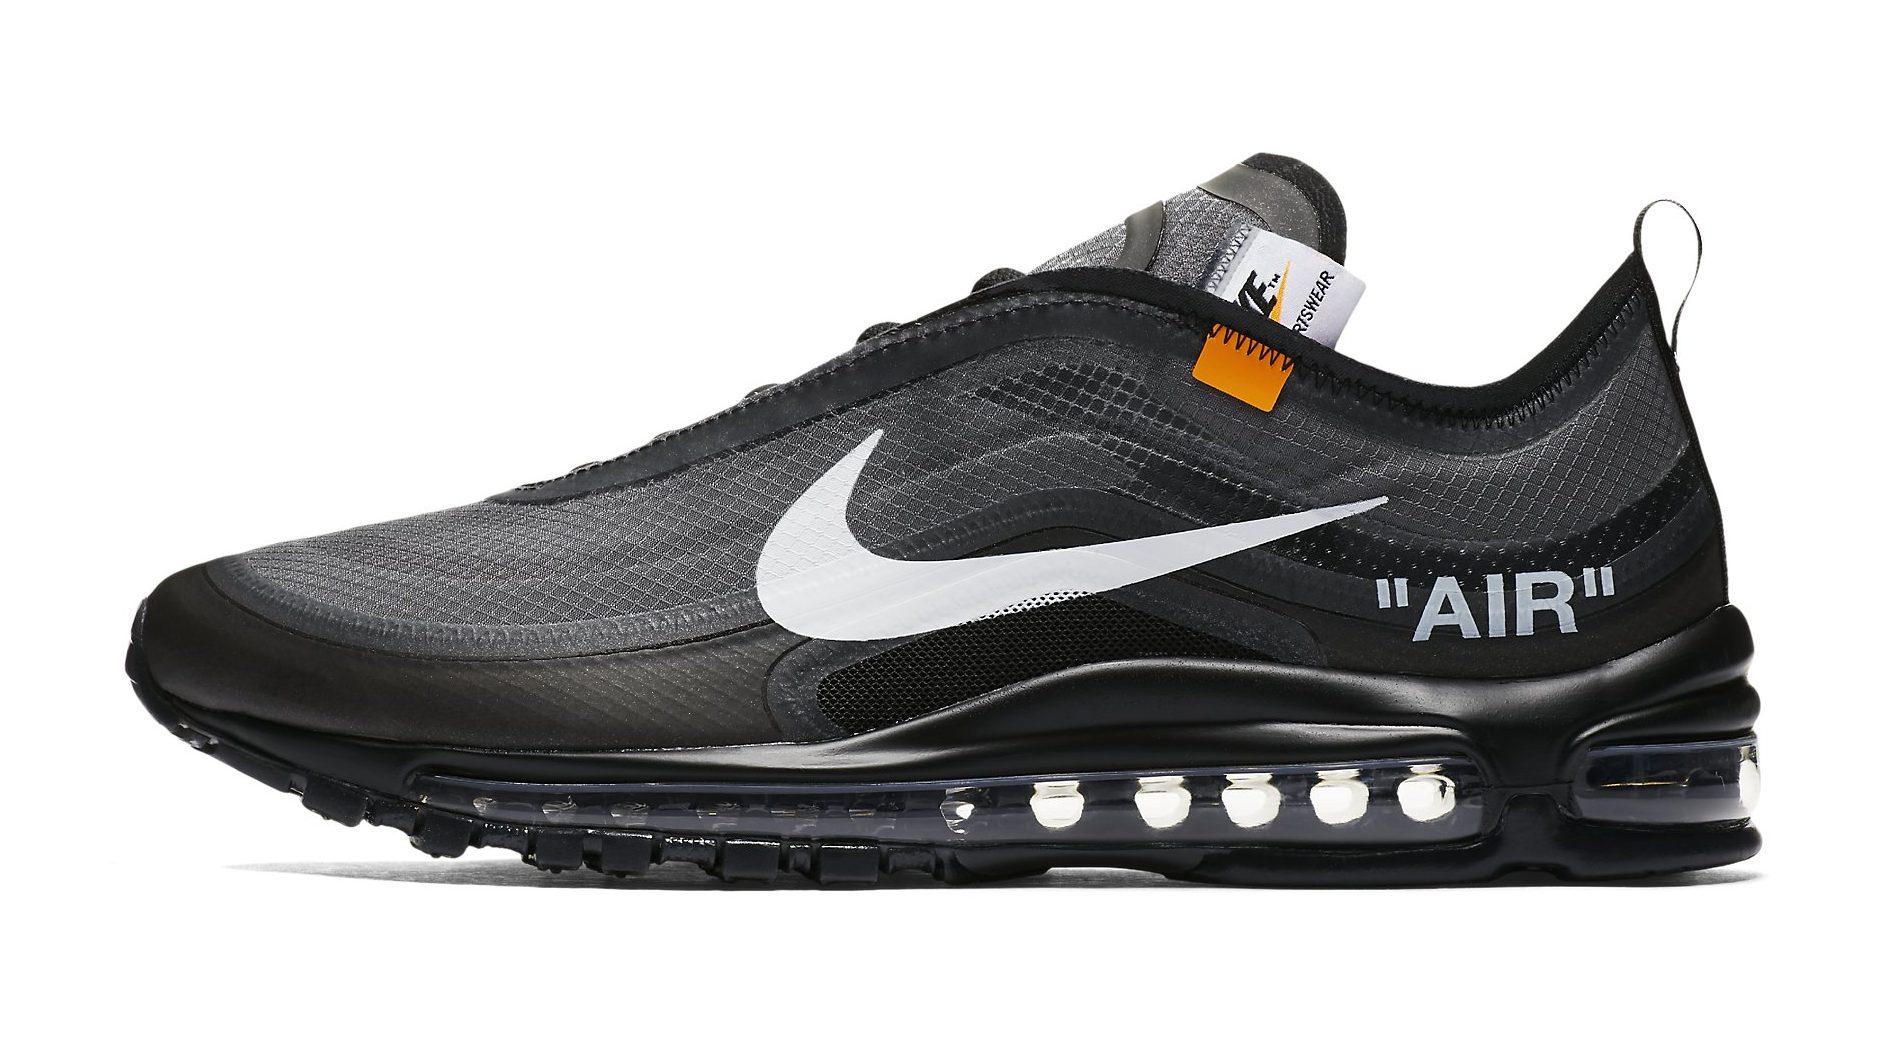 Off-White x Nike Air Max 97 Black Is